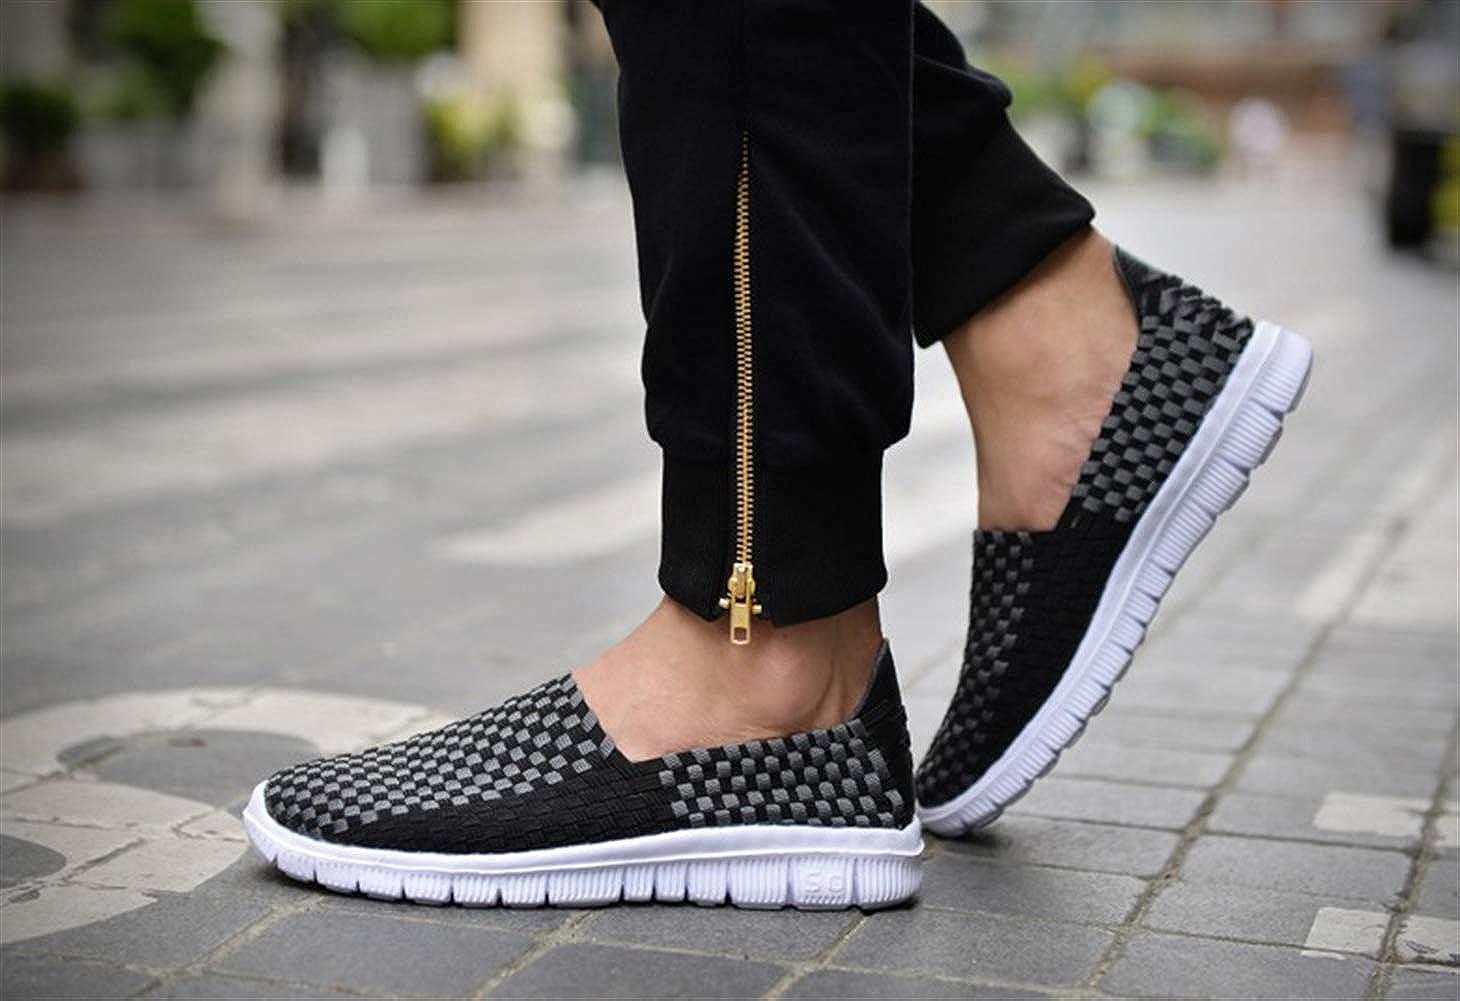 Liveinu Men Hand Woven Sandals Slip-Ons Summer Breathable Comfort Flat Loafer Walking Shoes